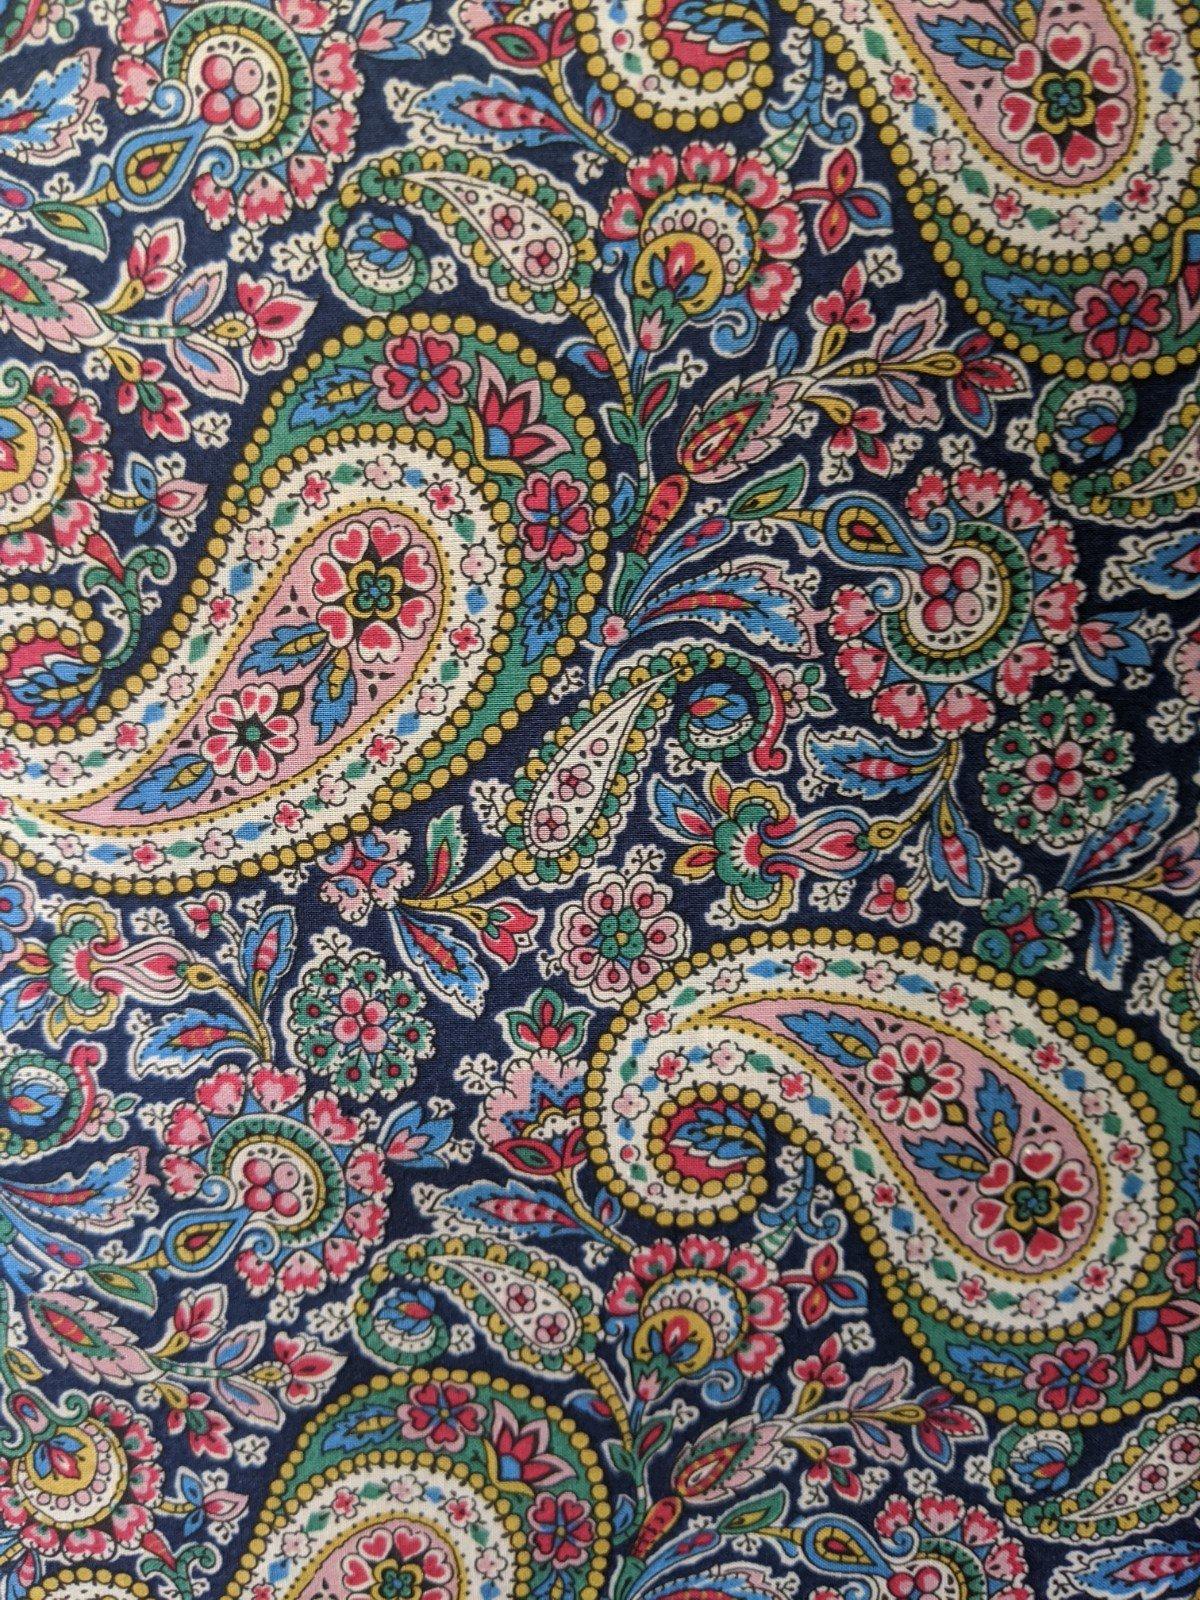 Liberty of London Cotton Lawn - Bright Paisley